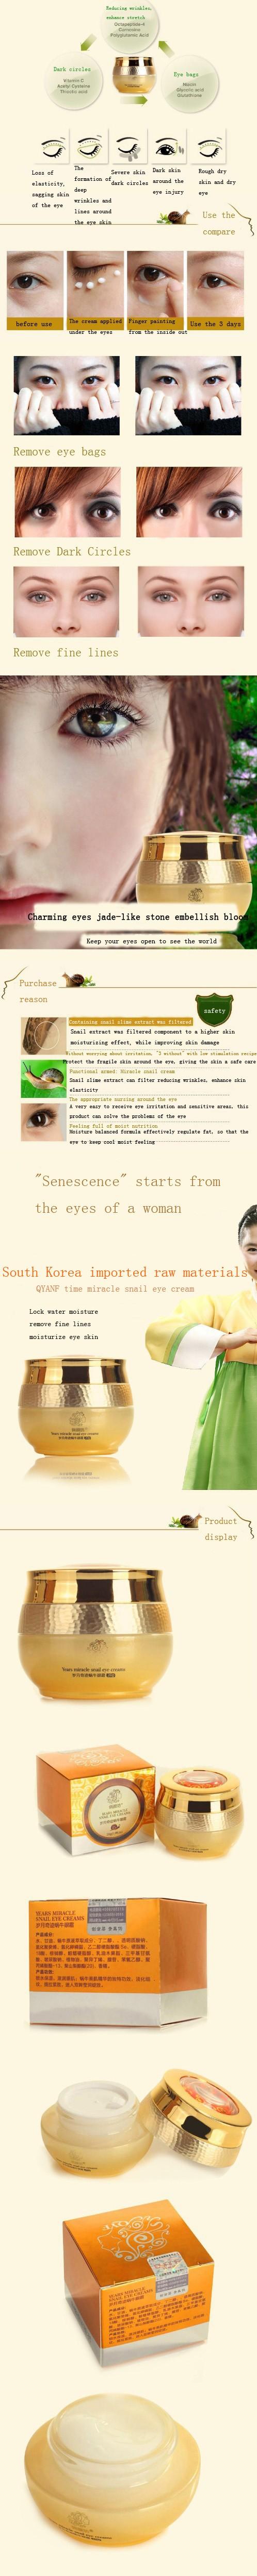 Snail Eye Cream Korea Imported Raw Materials Remover Dark Circle 2 In 1 Premium